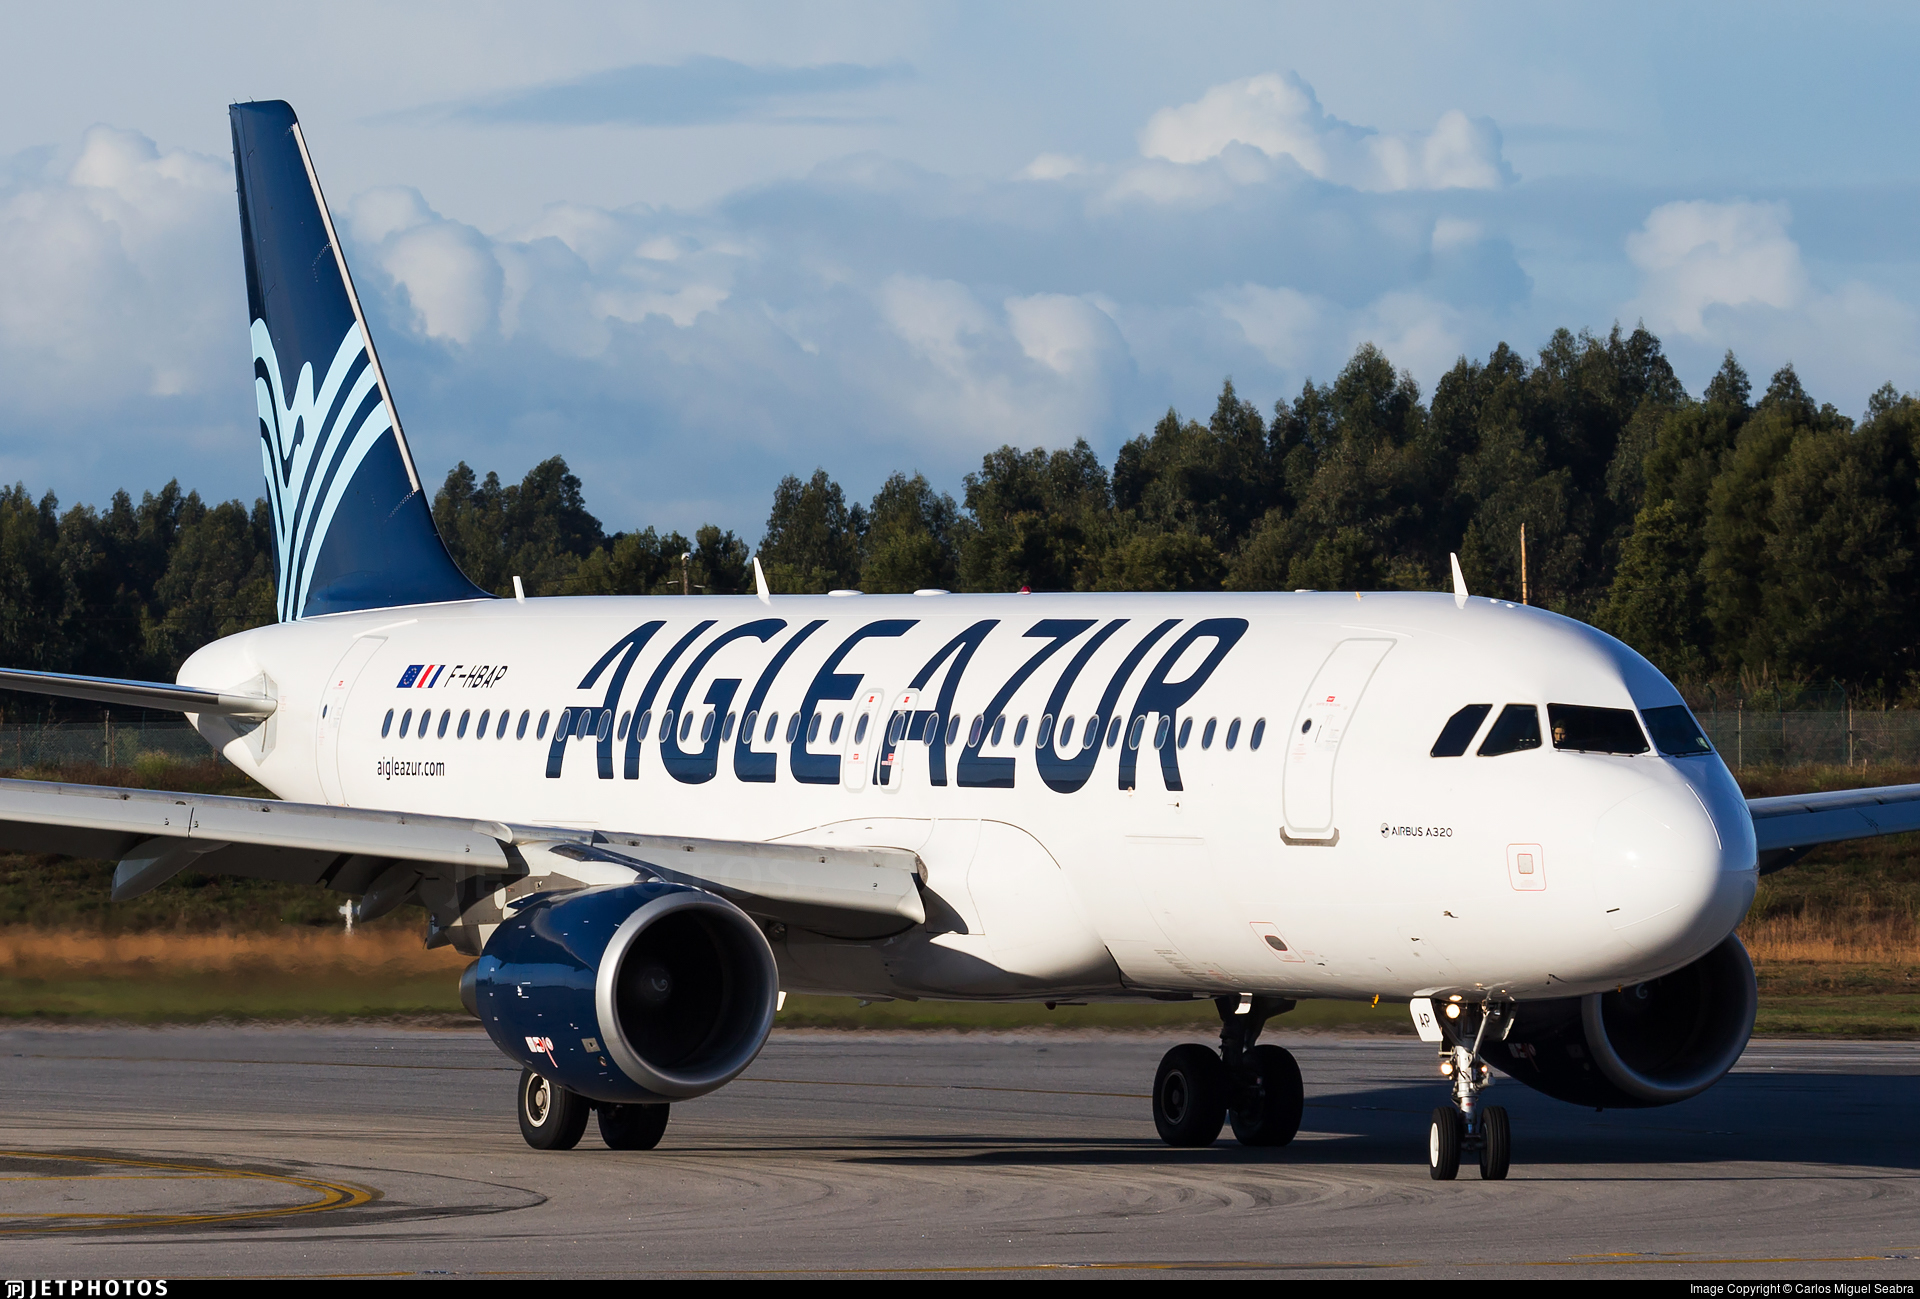 AUTOCOLLANT STICKER AUFKLEBER AIRBUS A319 AIGLE AZUR AIRLINE